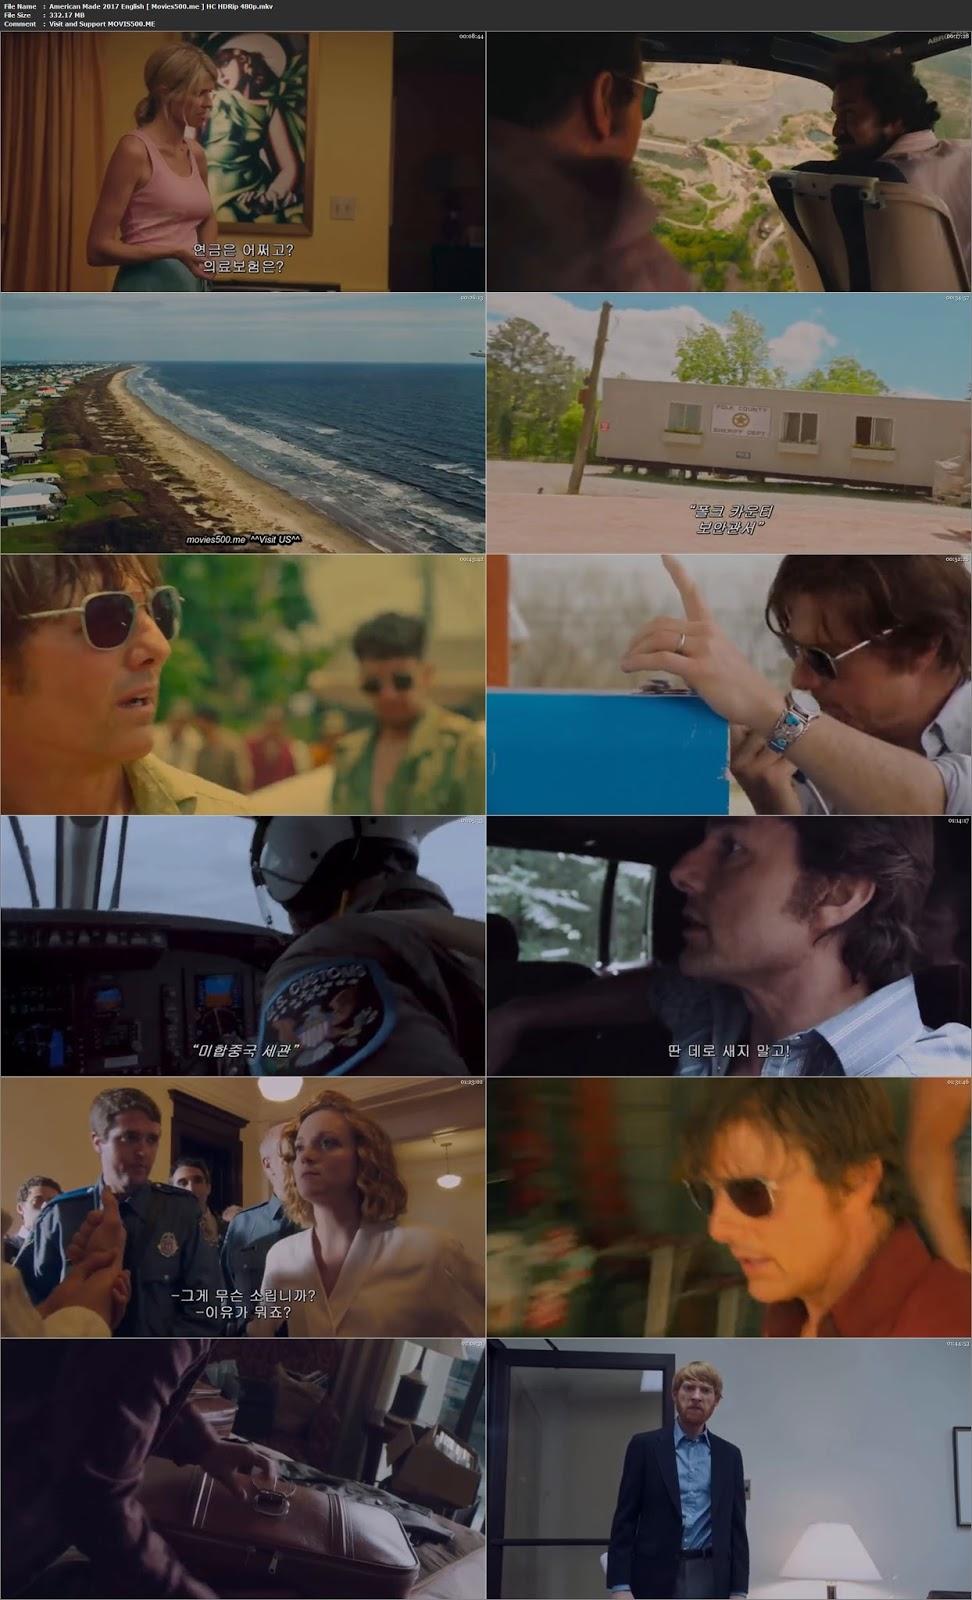 American Made 2017 Hollywood Full Movie 300MB HDRip 480p